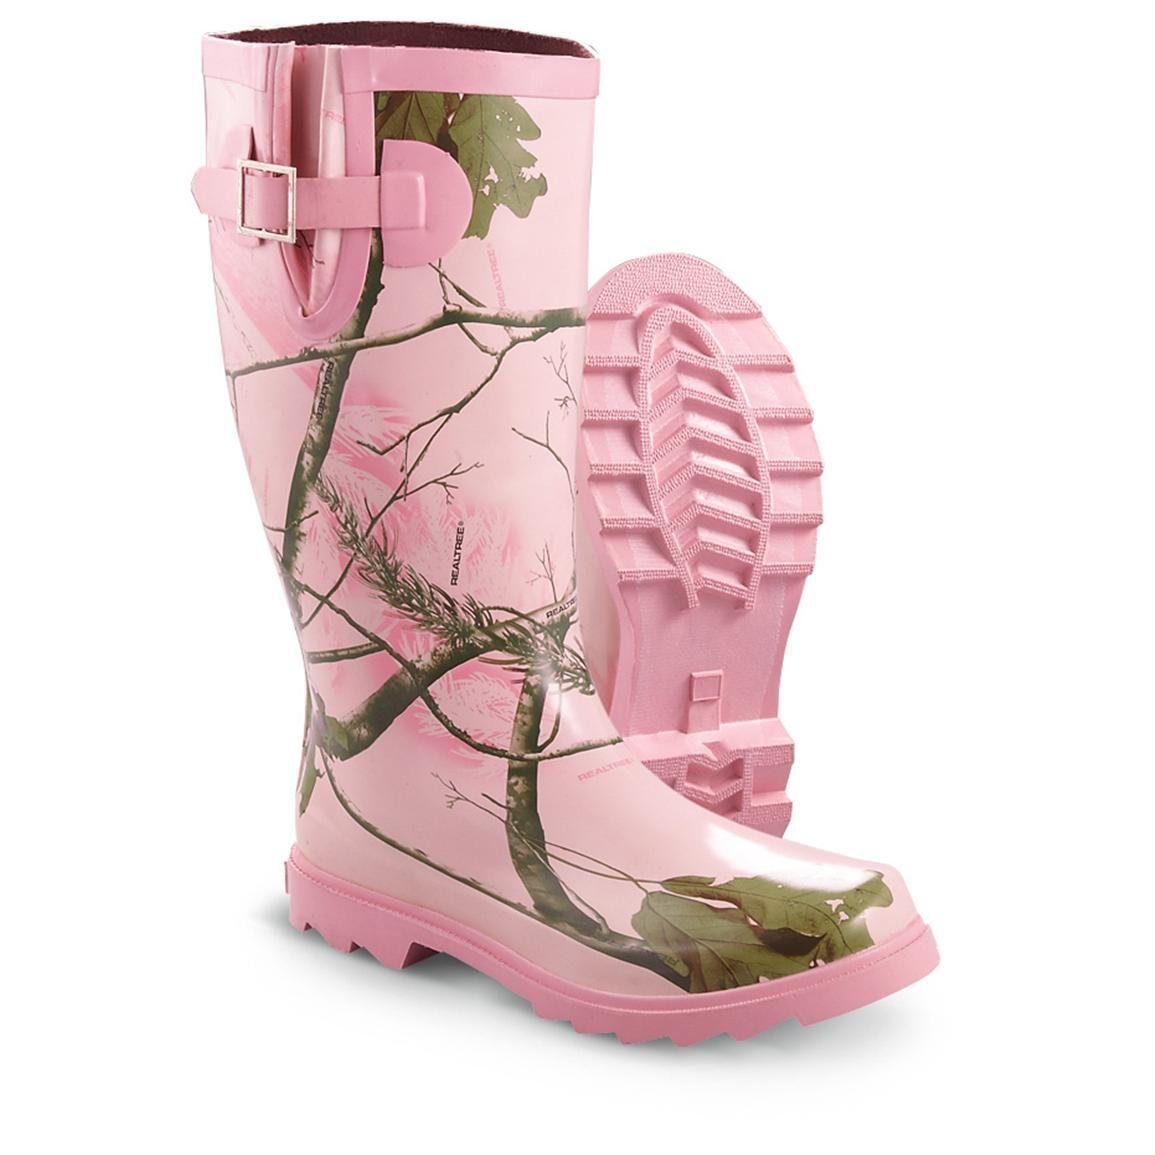 Realtree Girl Women's Ms. JoJo Rain Boots - 234750, Rubber & Rain Boots at  Sportsman's Guide